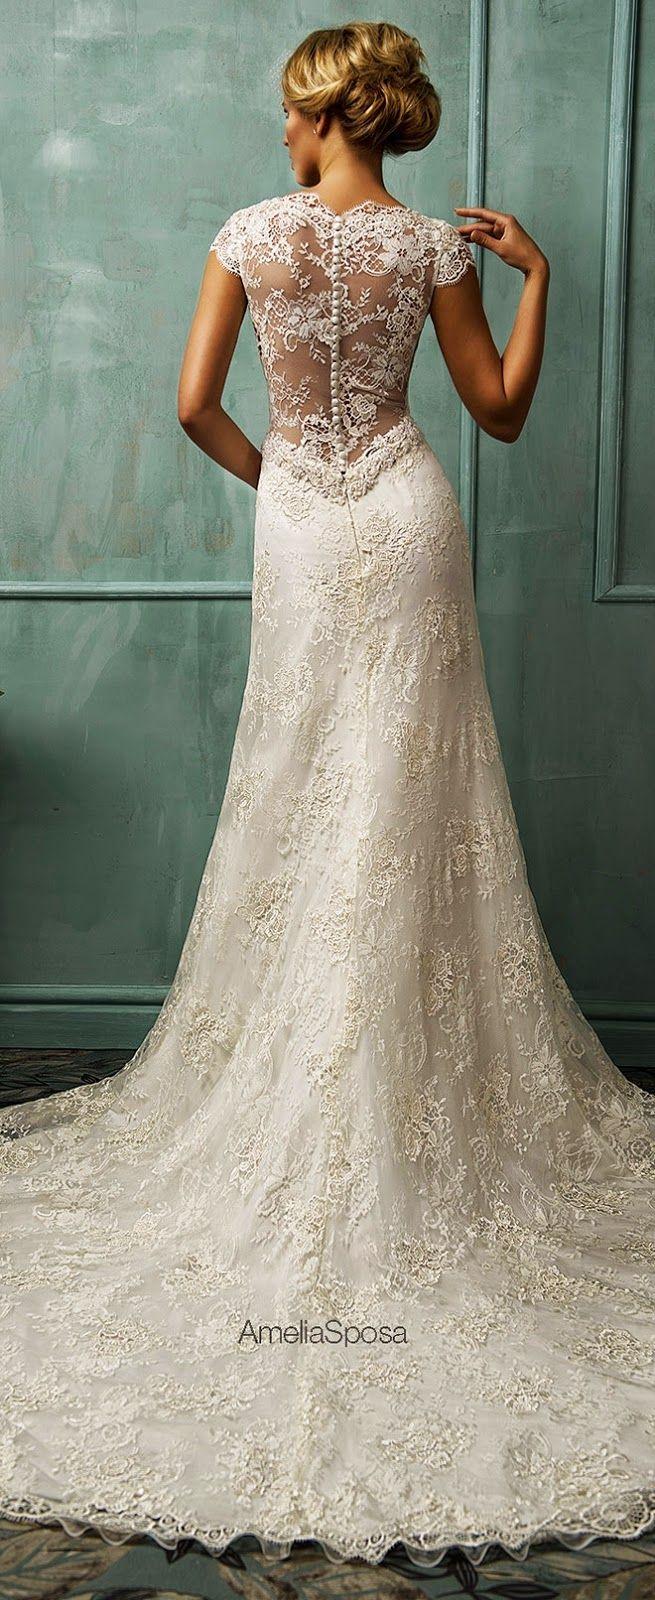 Amelia Sposa 2014 Wedding Dresses | Amelia sposa, Amelia and Wedding ...